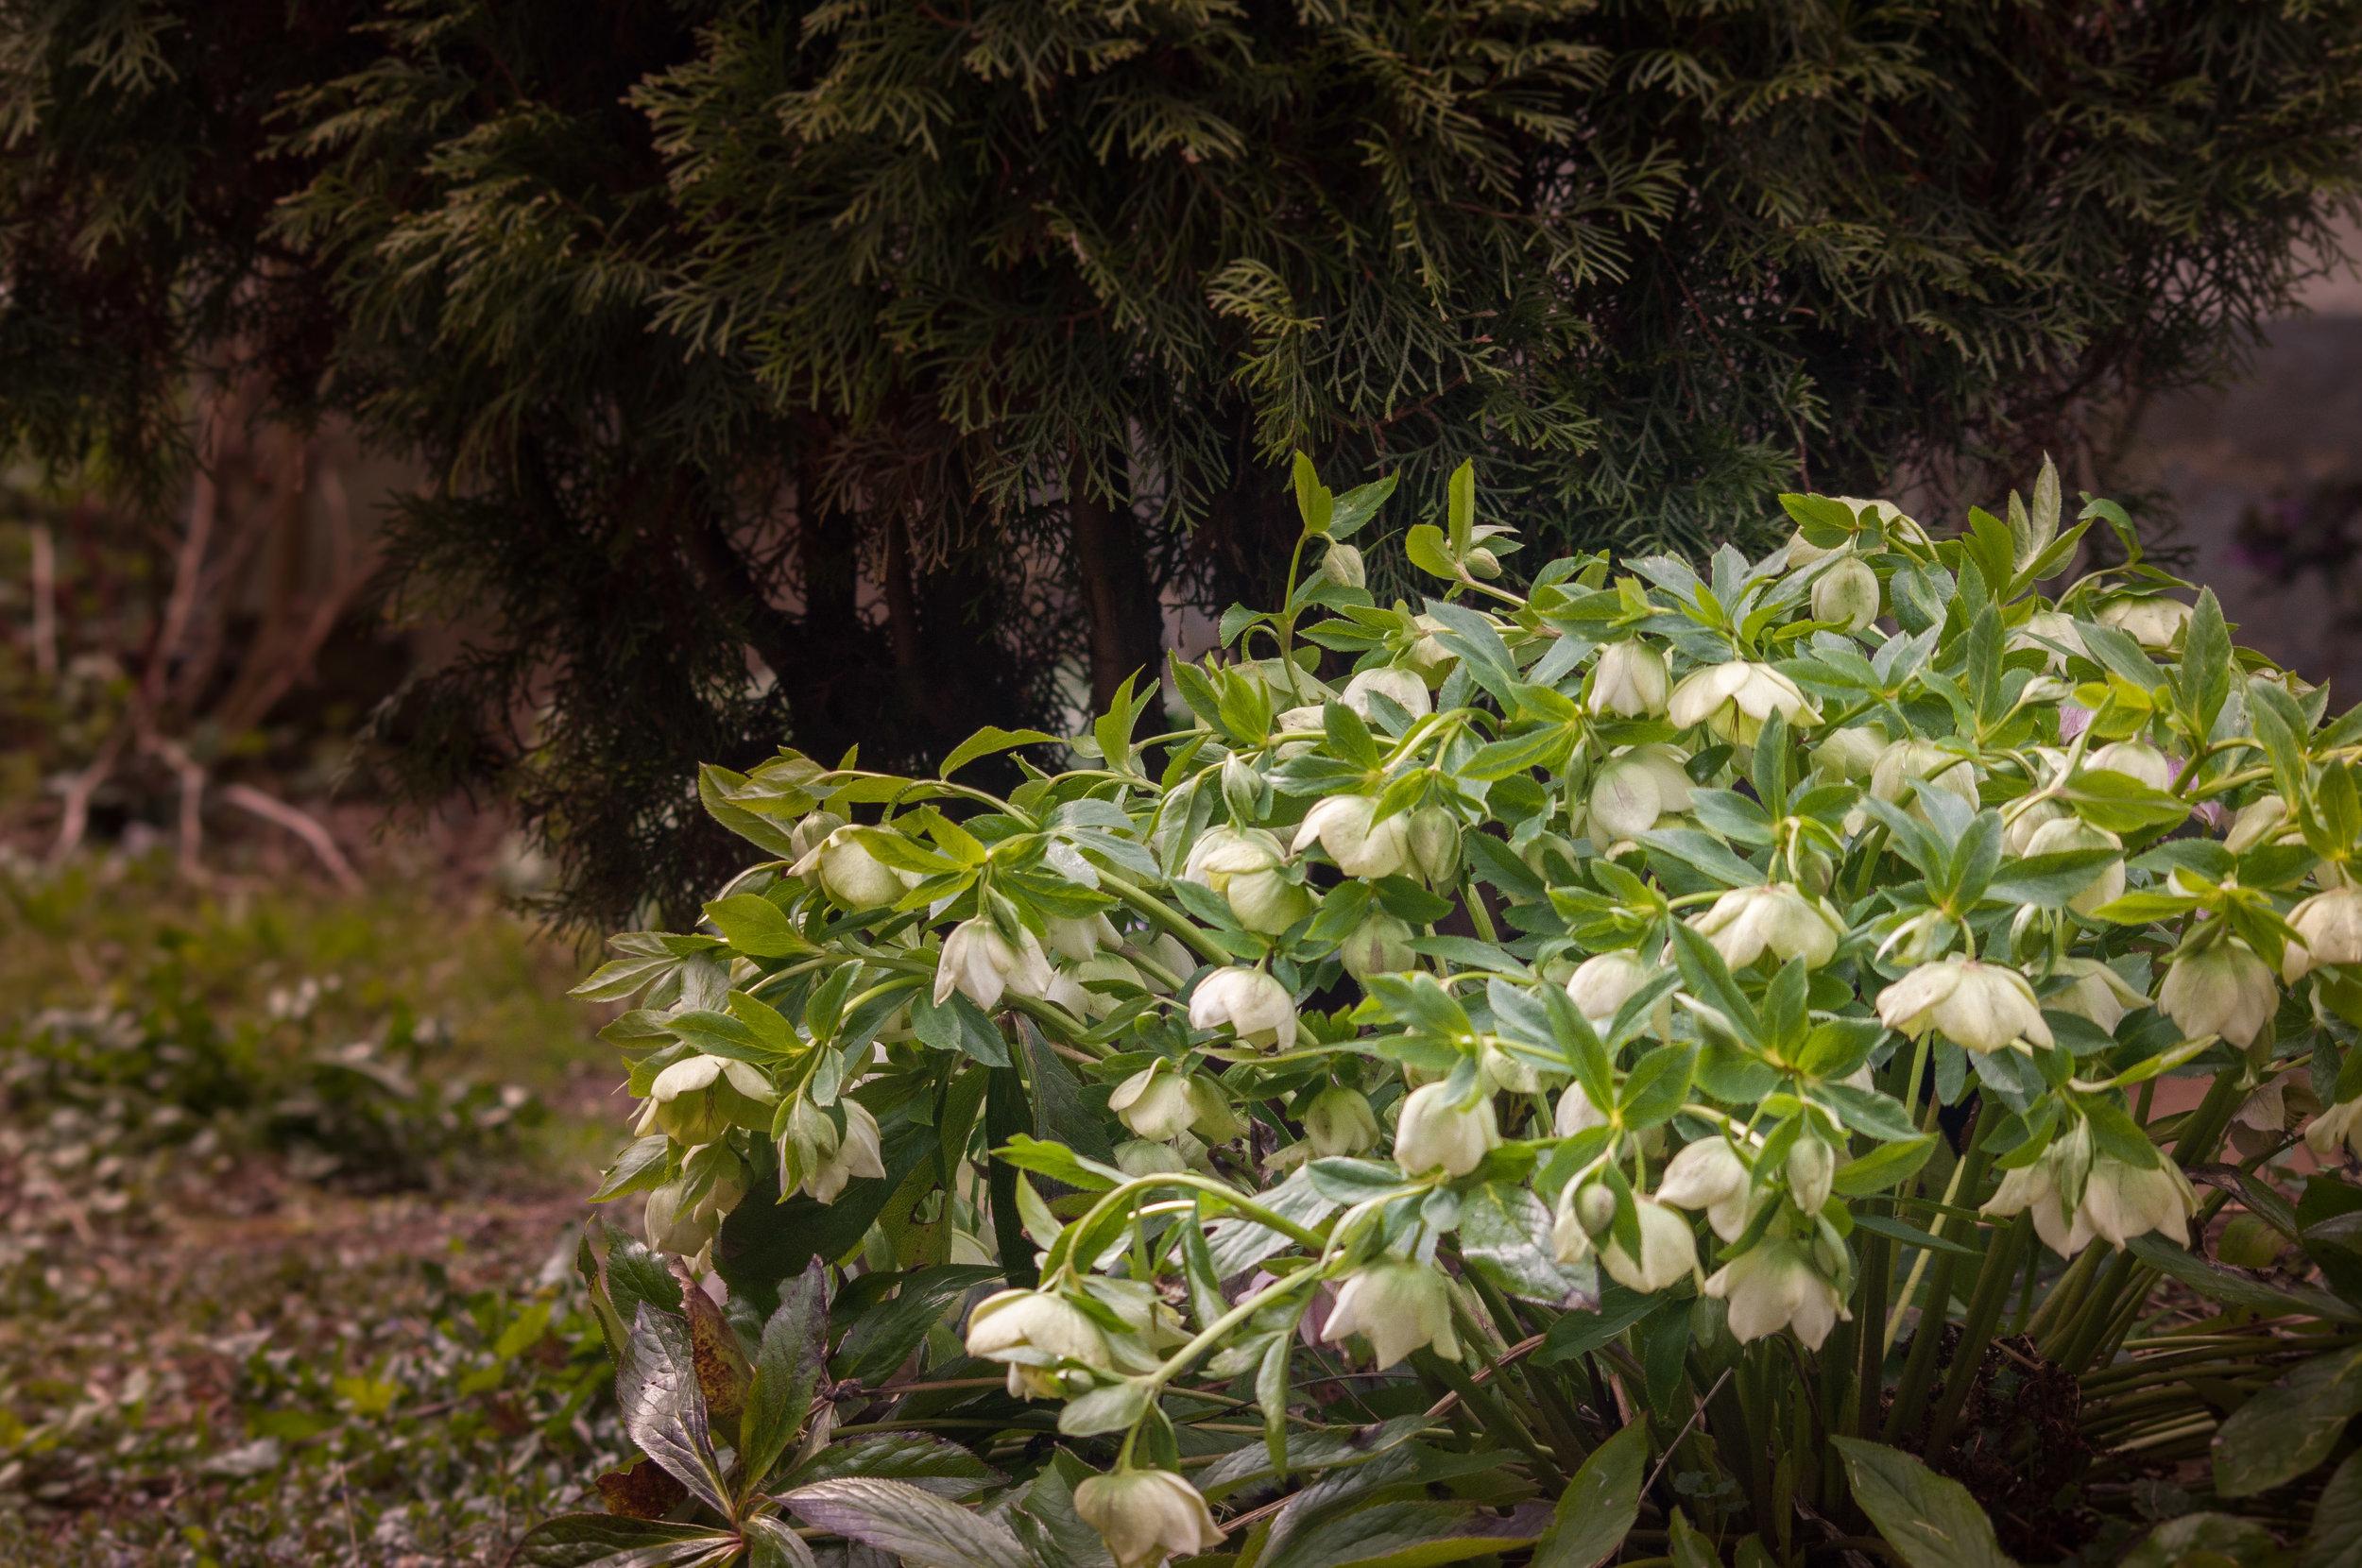 hellébore hybride au pied d'un thuya